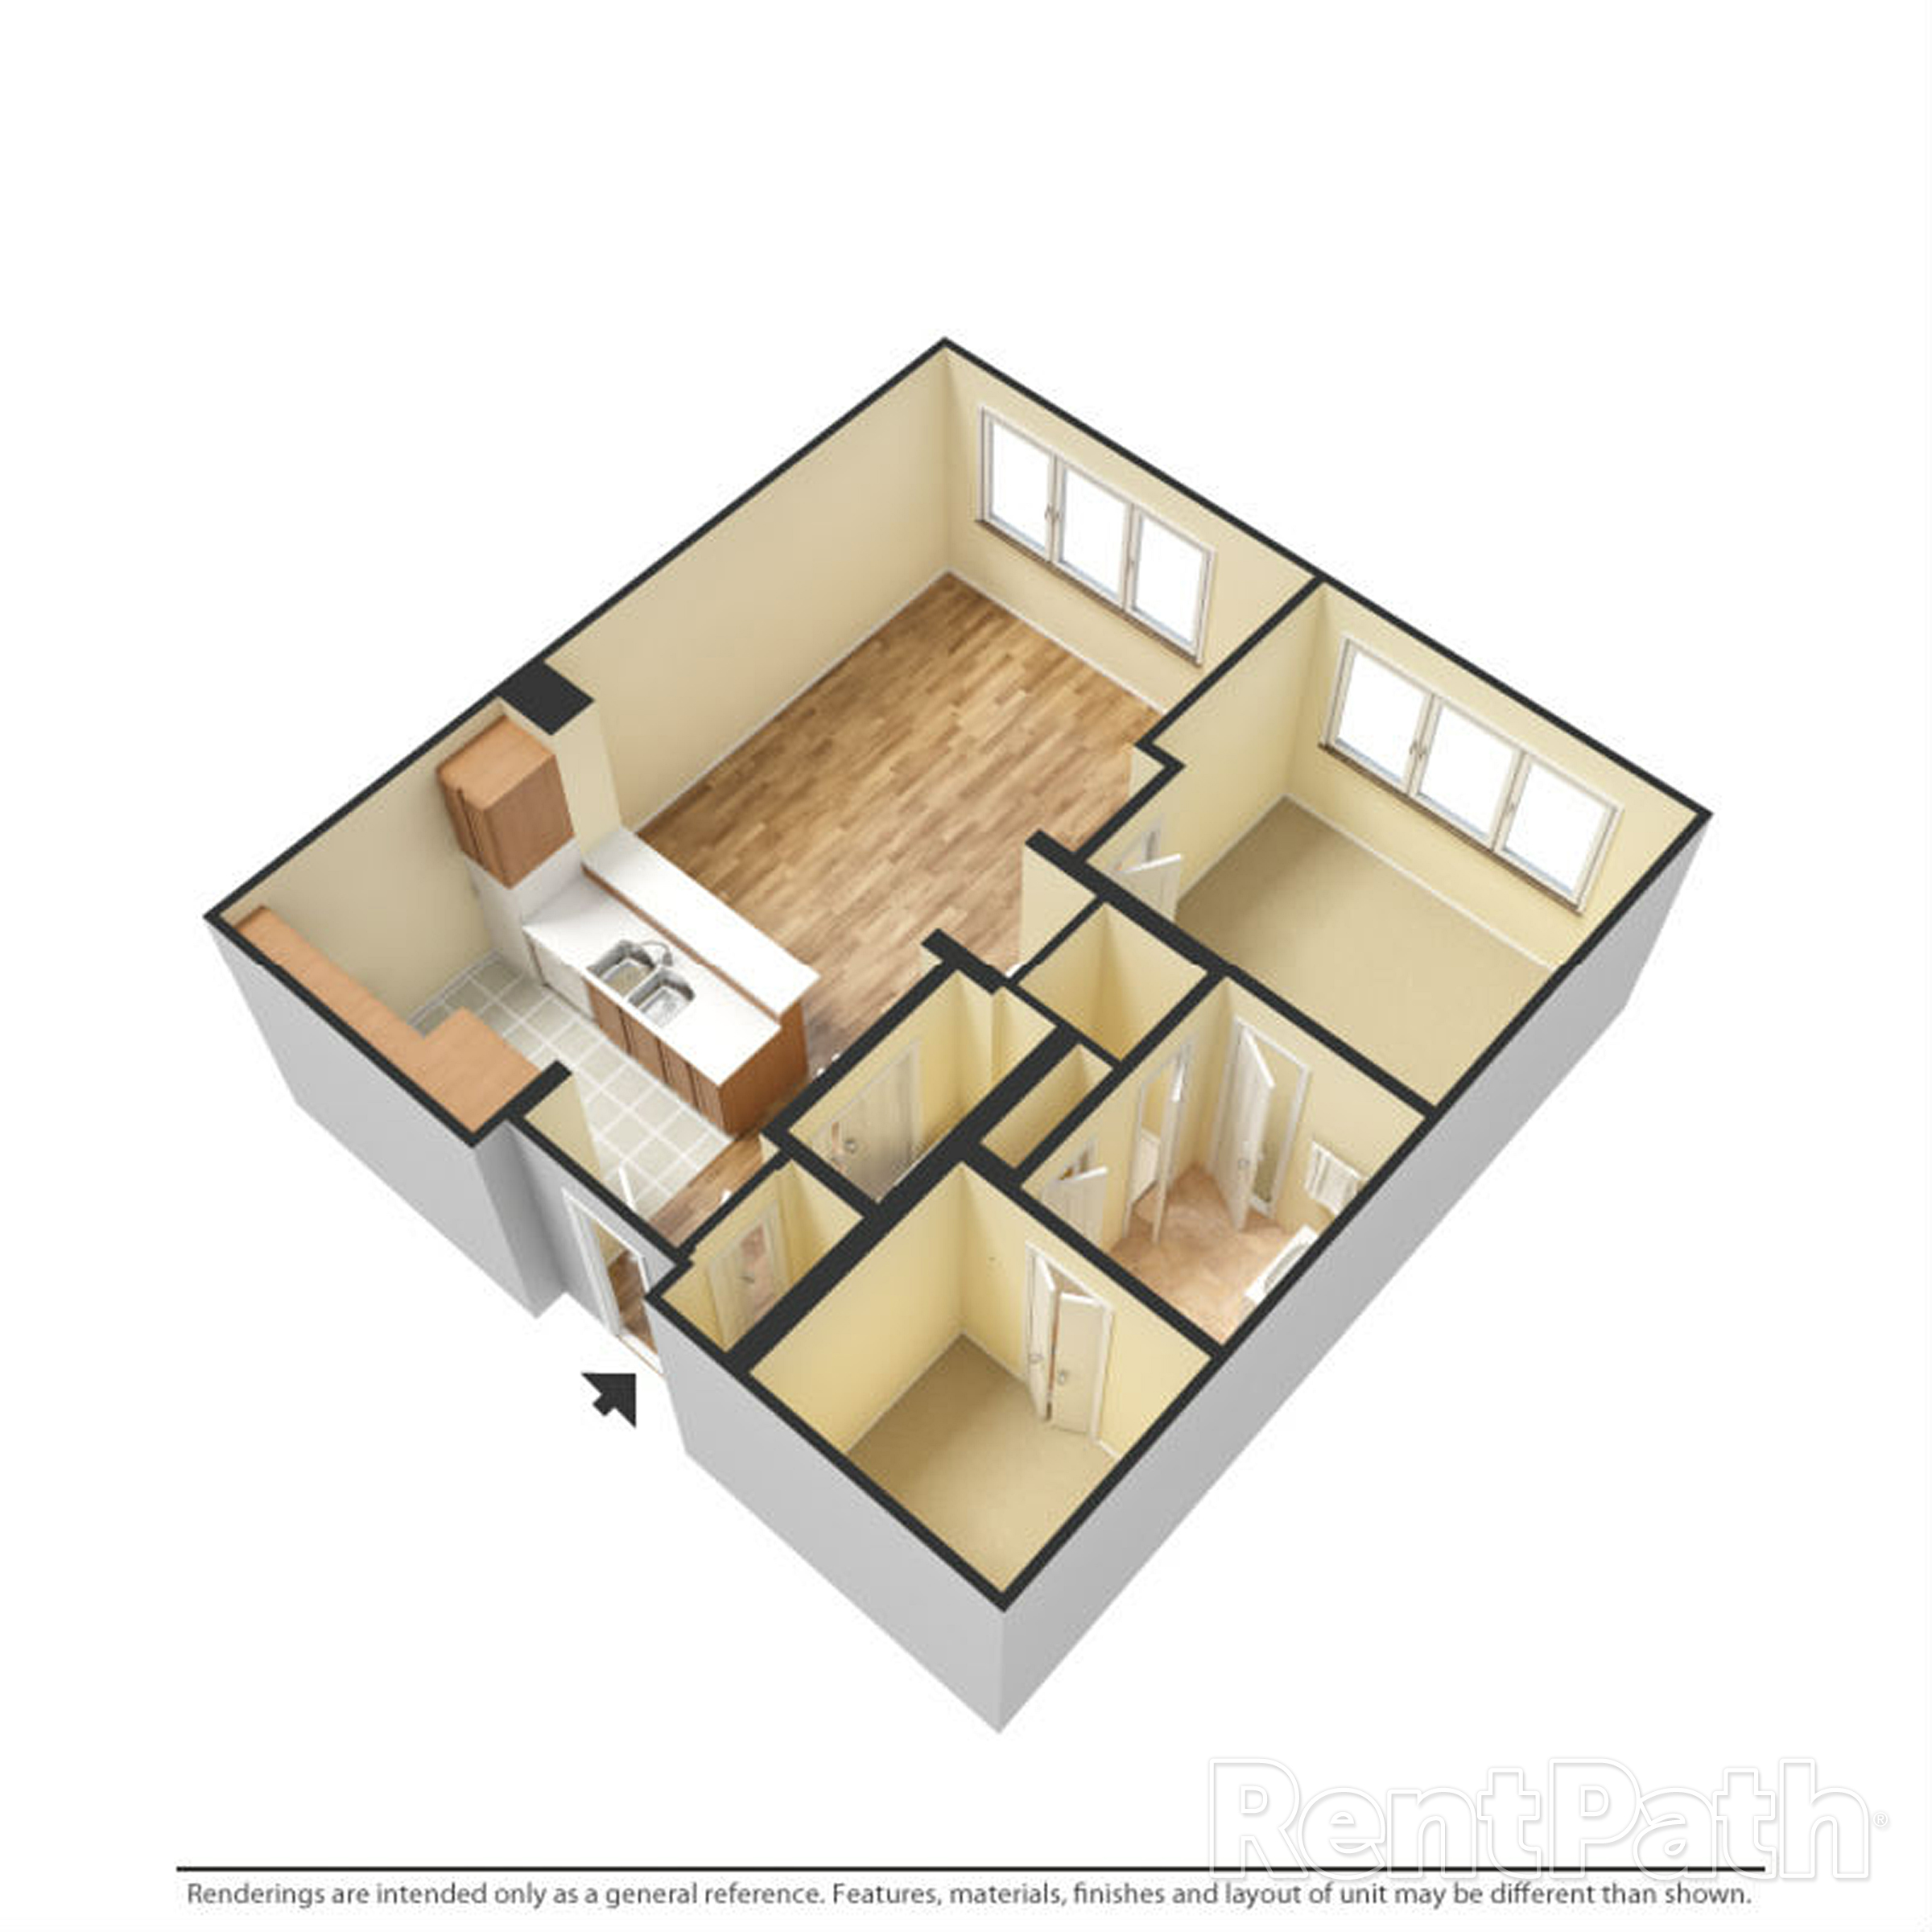 Phenomenal Floor Plans The Porter Brewers Hill Balitmore Md Download Free Architecture Designs Scobabritishbridgeorg